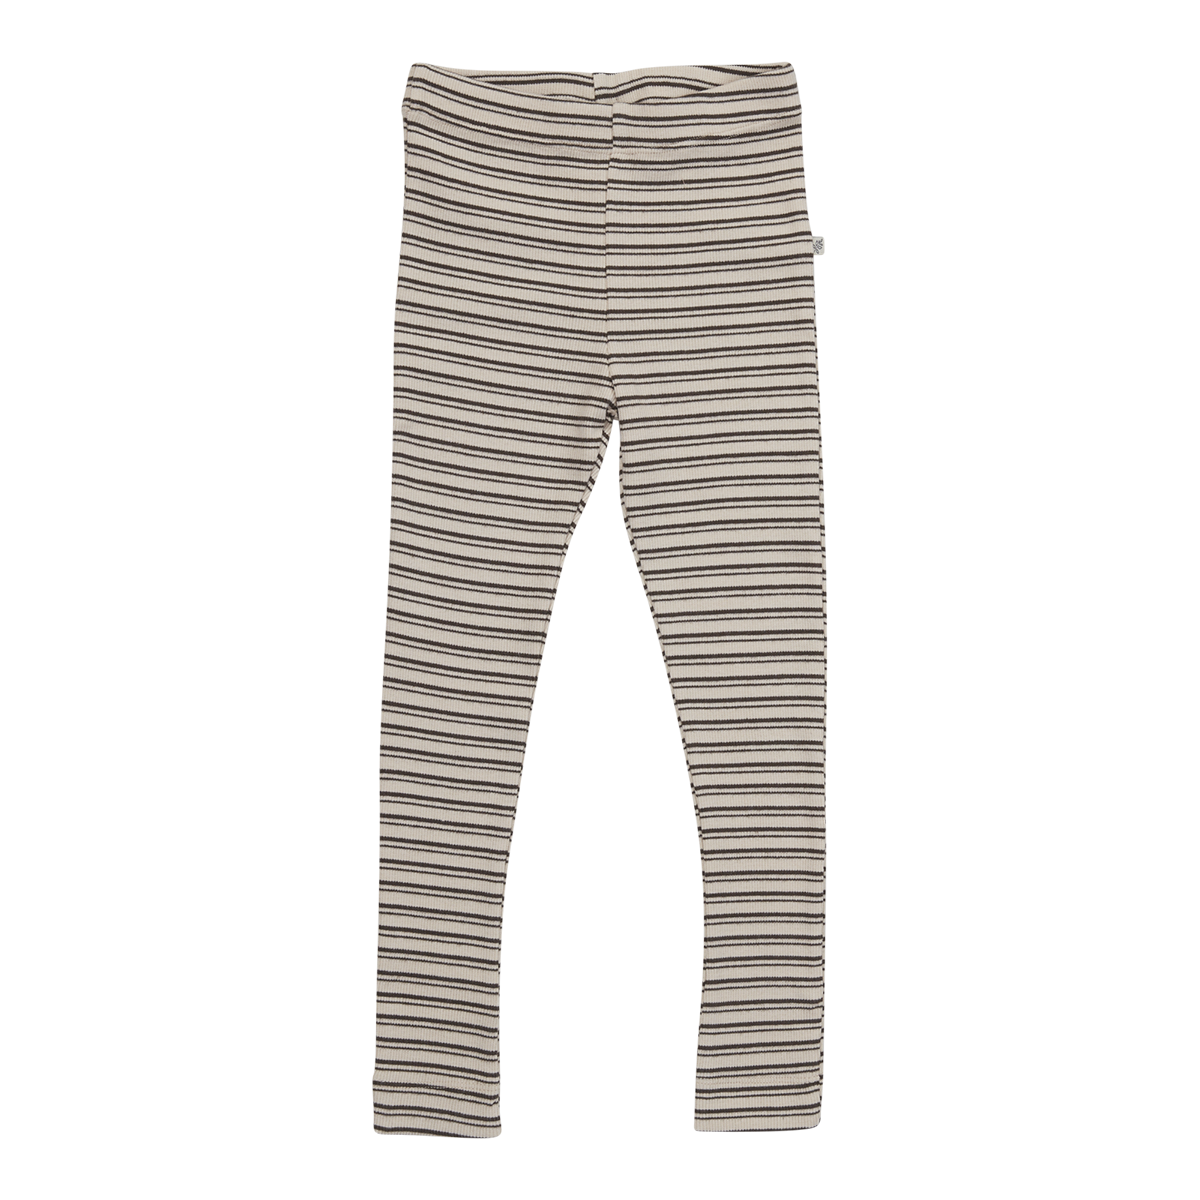 Blossom Kids Legging - stripes - Cinnamon-1